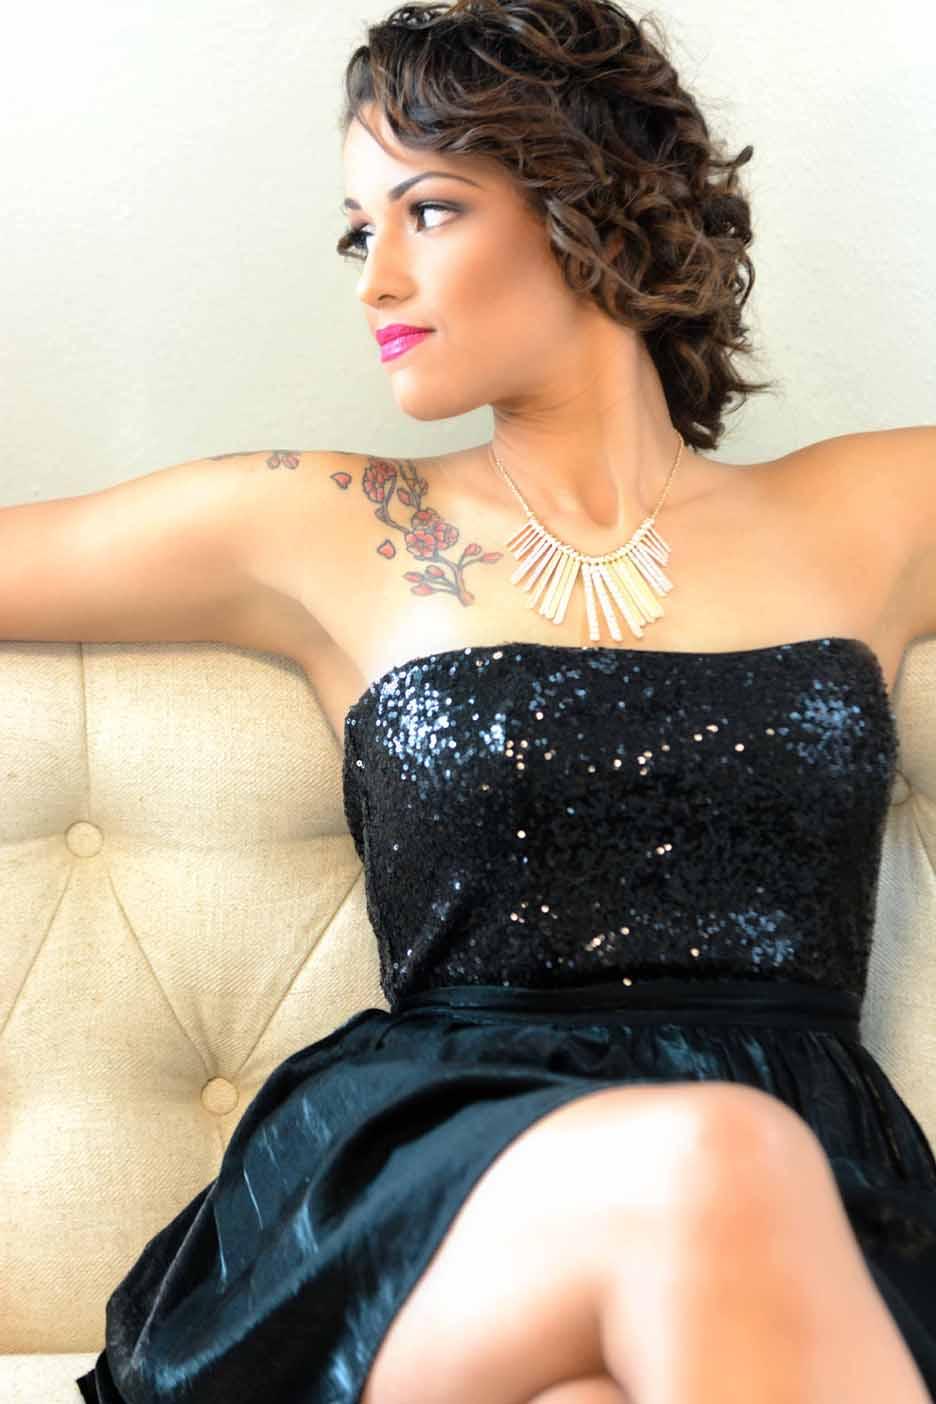 Dallas Boudoir Photography, Class Act, Wonderland Boudoir, Boudoir Dallas Photography, Dominican Girls, Fashion, Photography